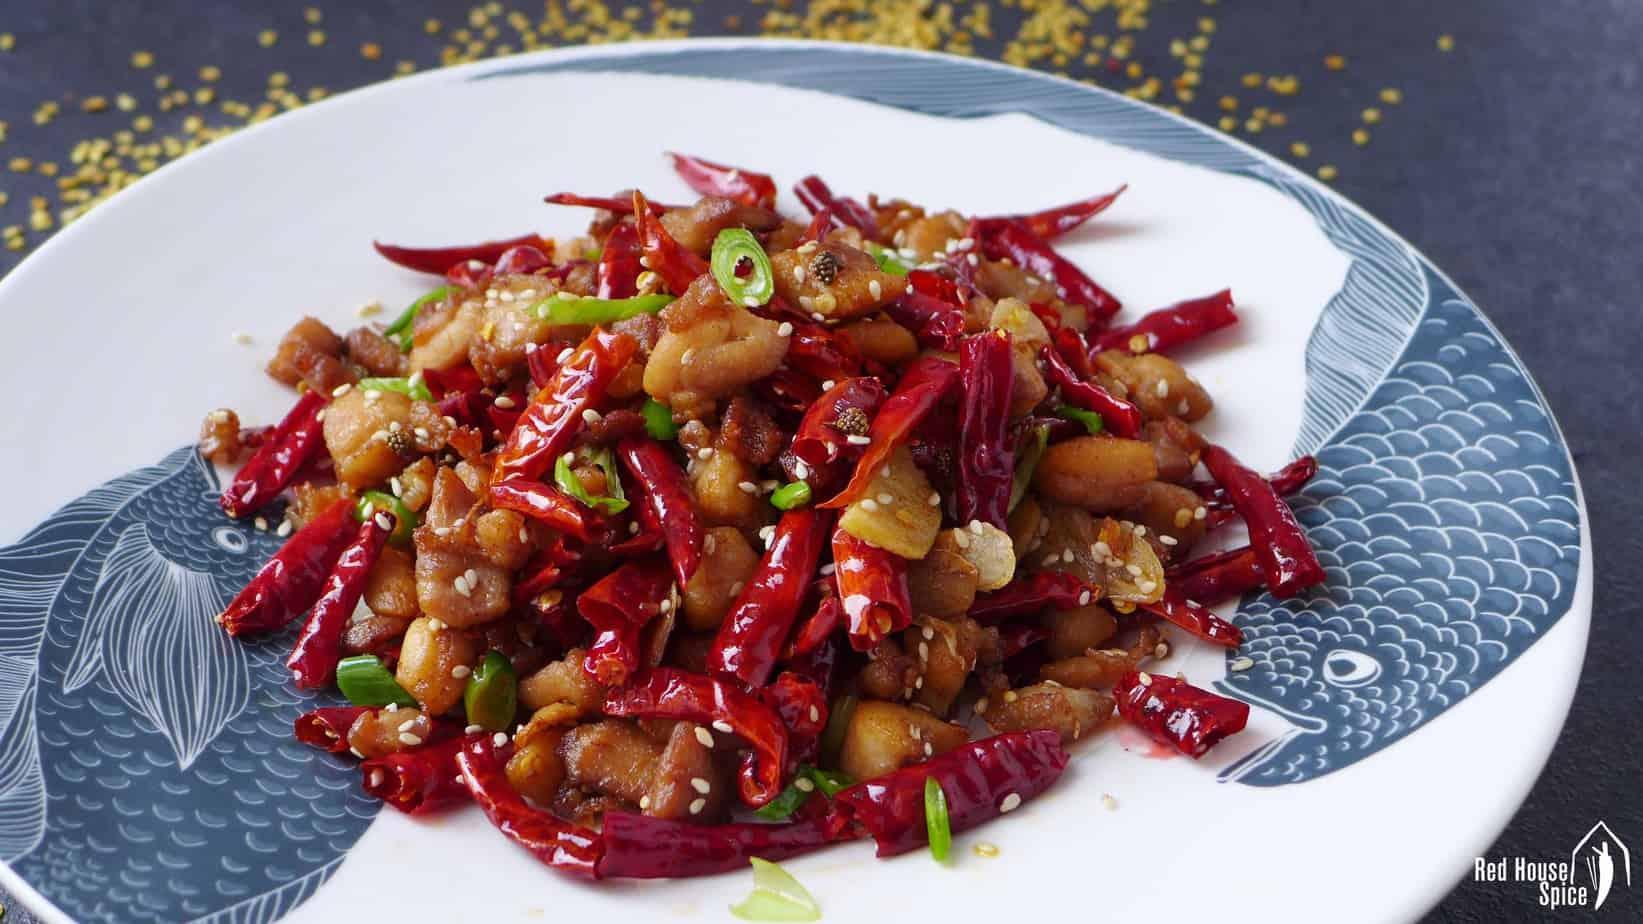 Mala chicken (Chongqing Laziji, 辣子鸡)